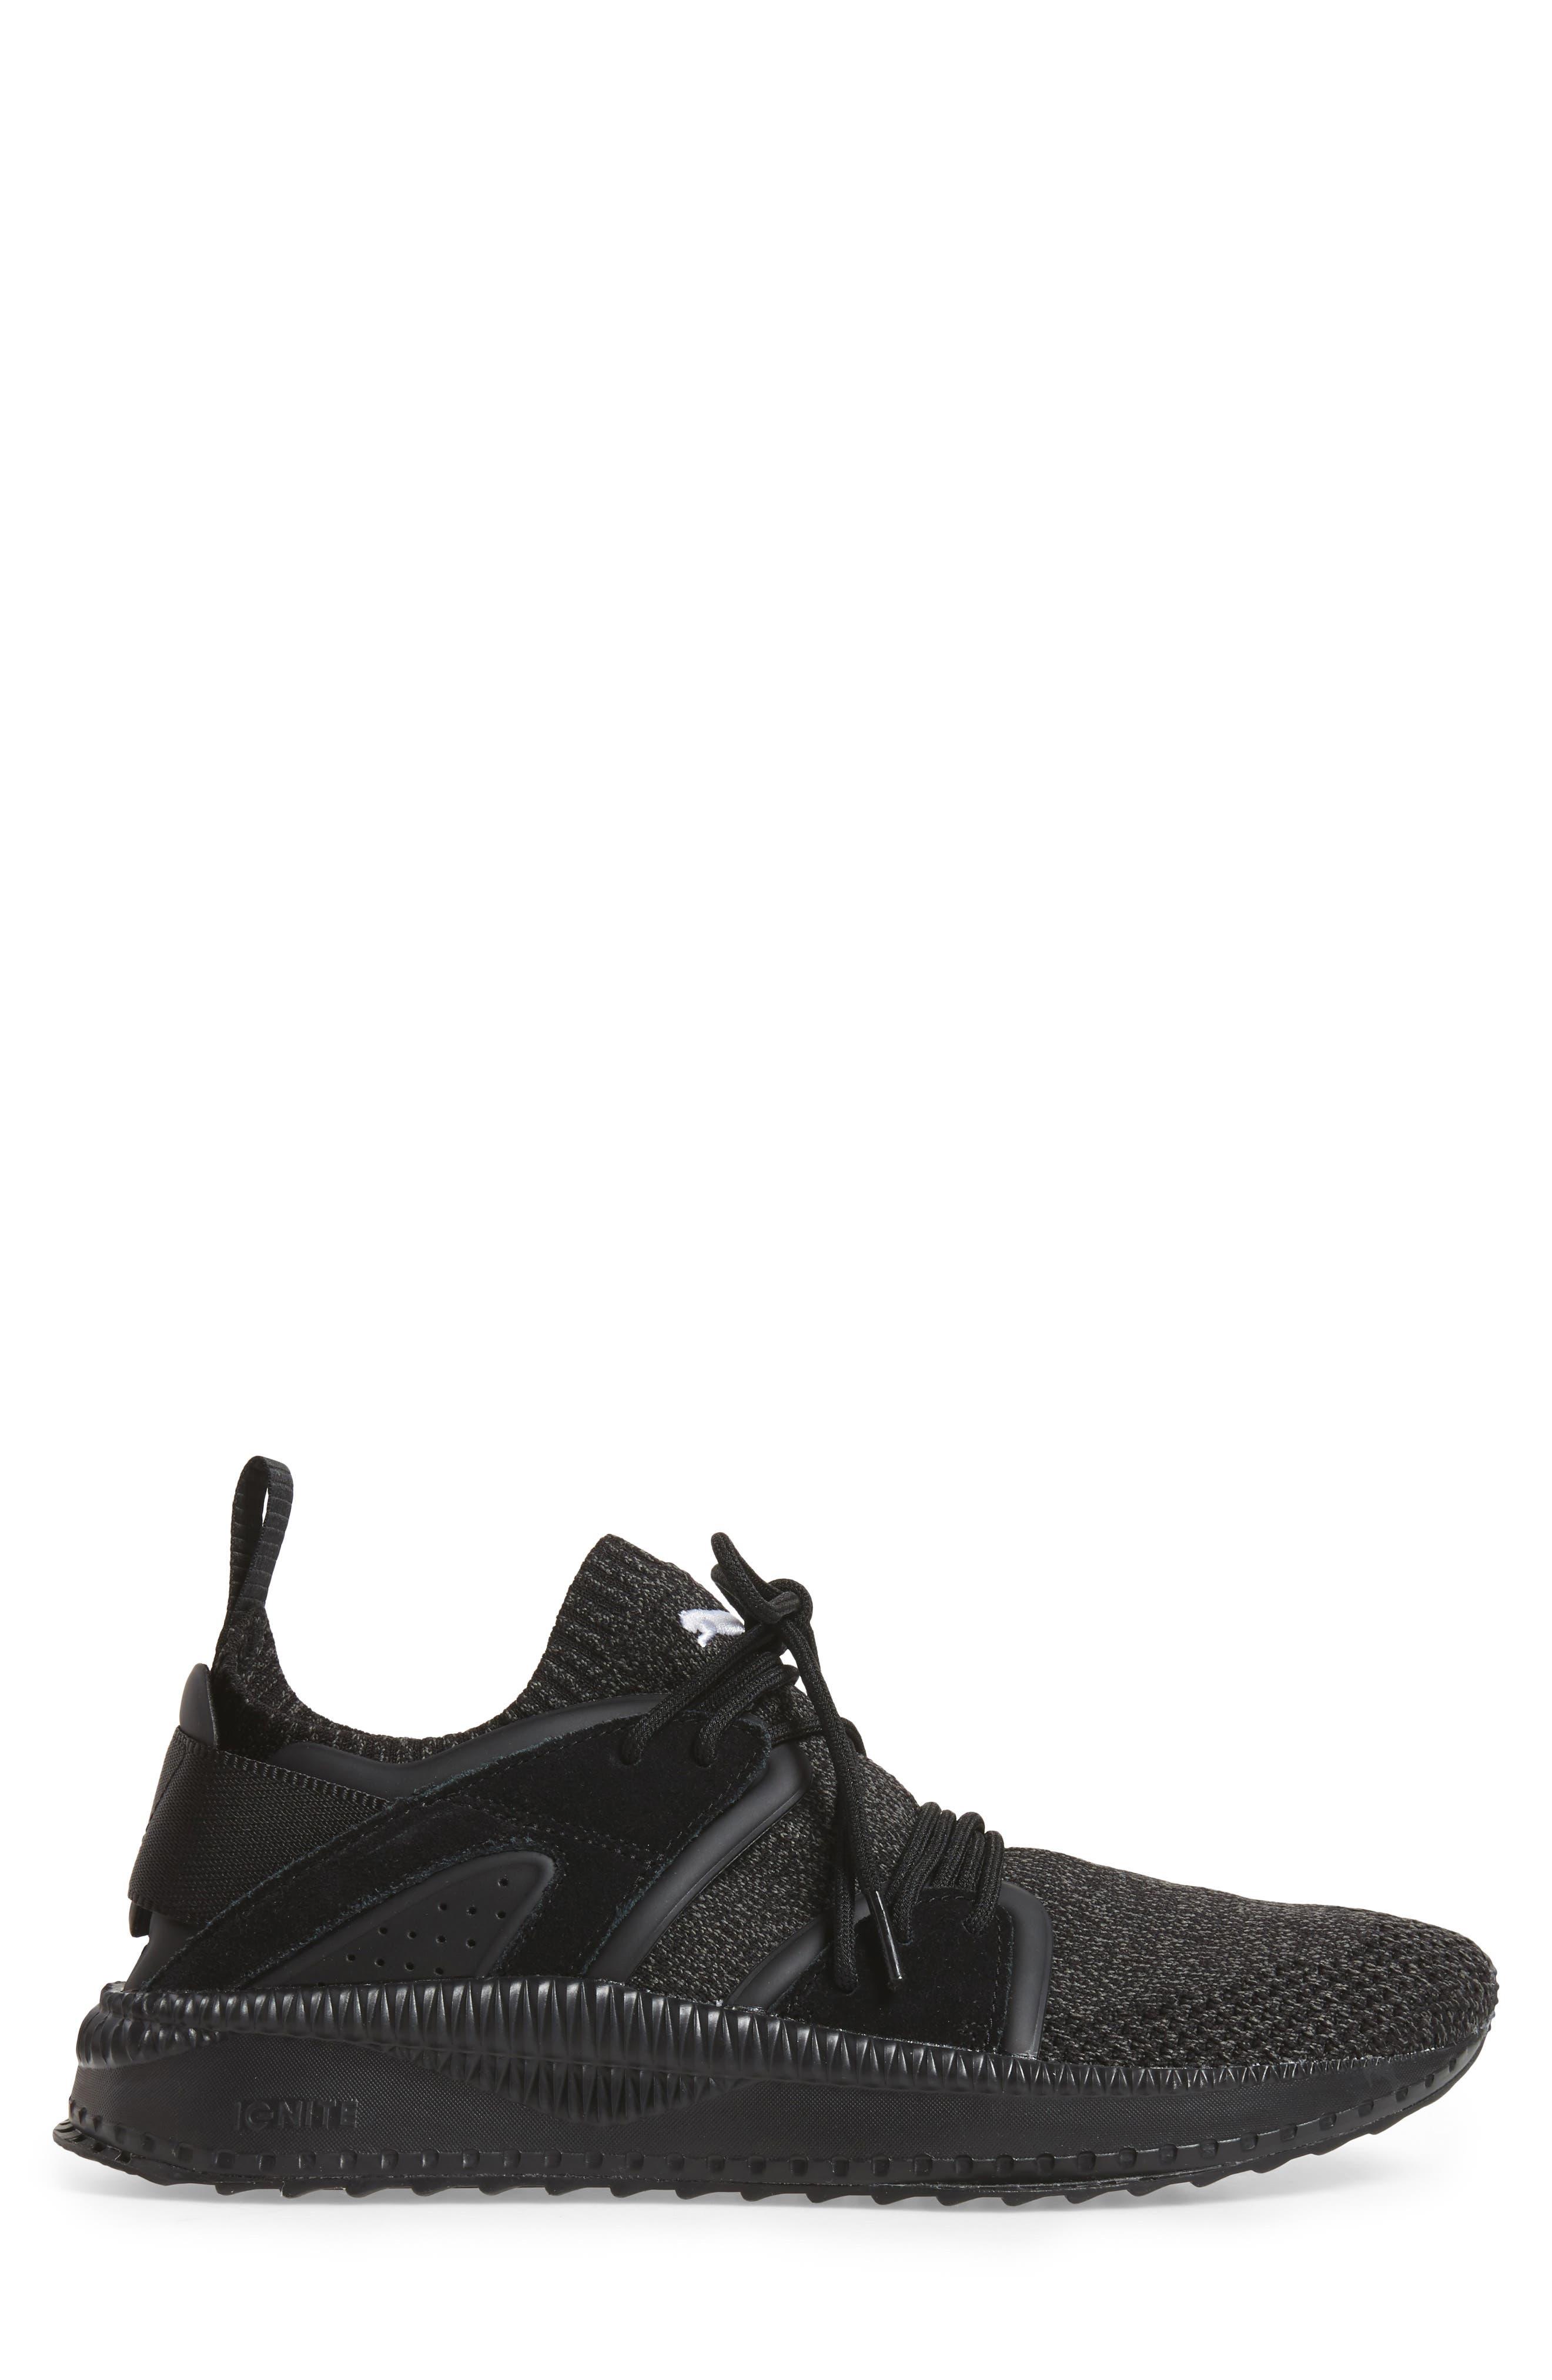 Alternate Image 3  - PUMA Tsugi Blaze EvoKnit Sneaker (Men)